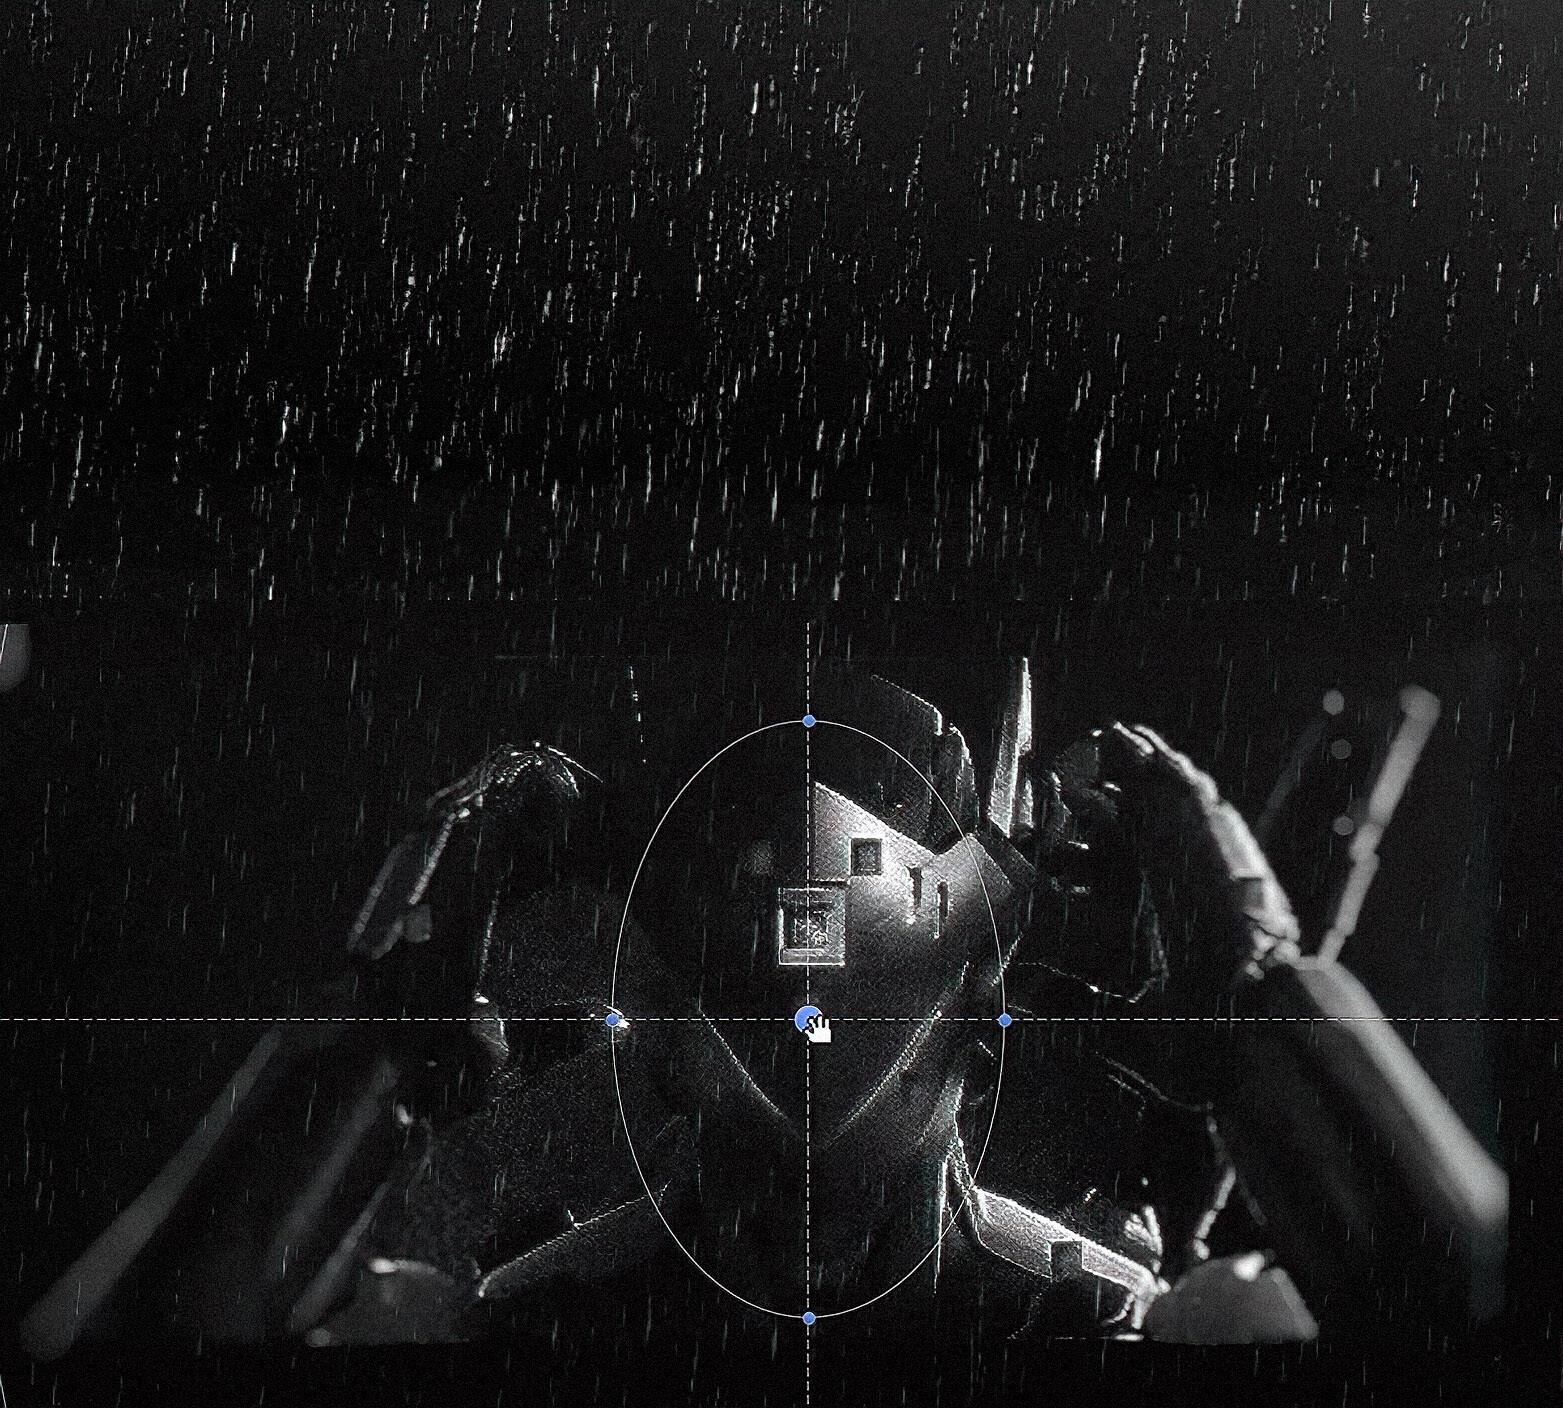 ⨁⨂⨁ RAIN ⨂⨁⨂